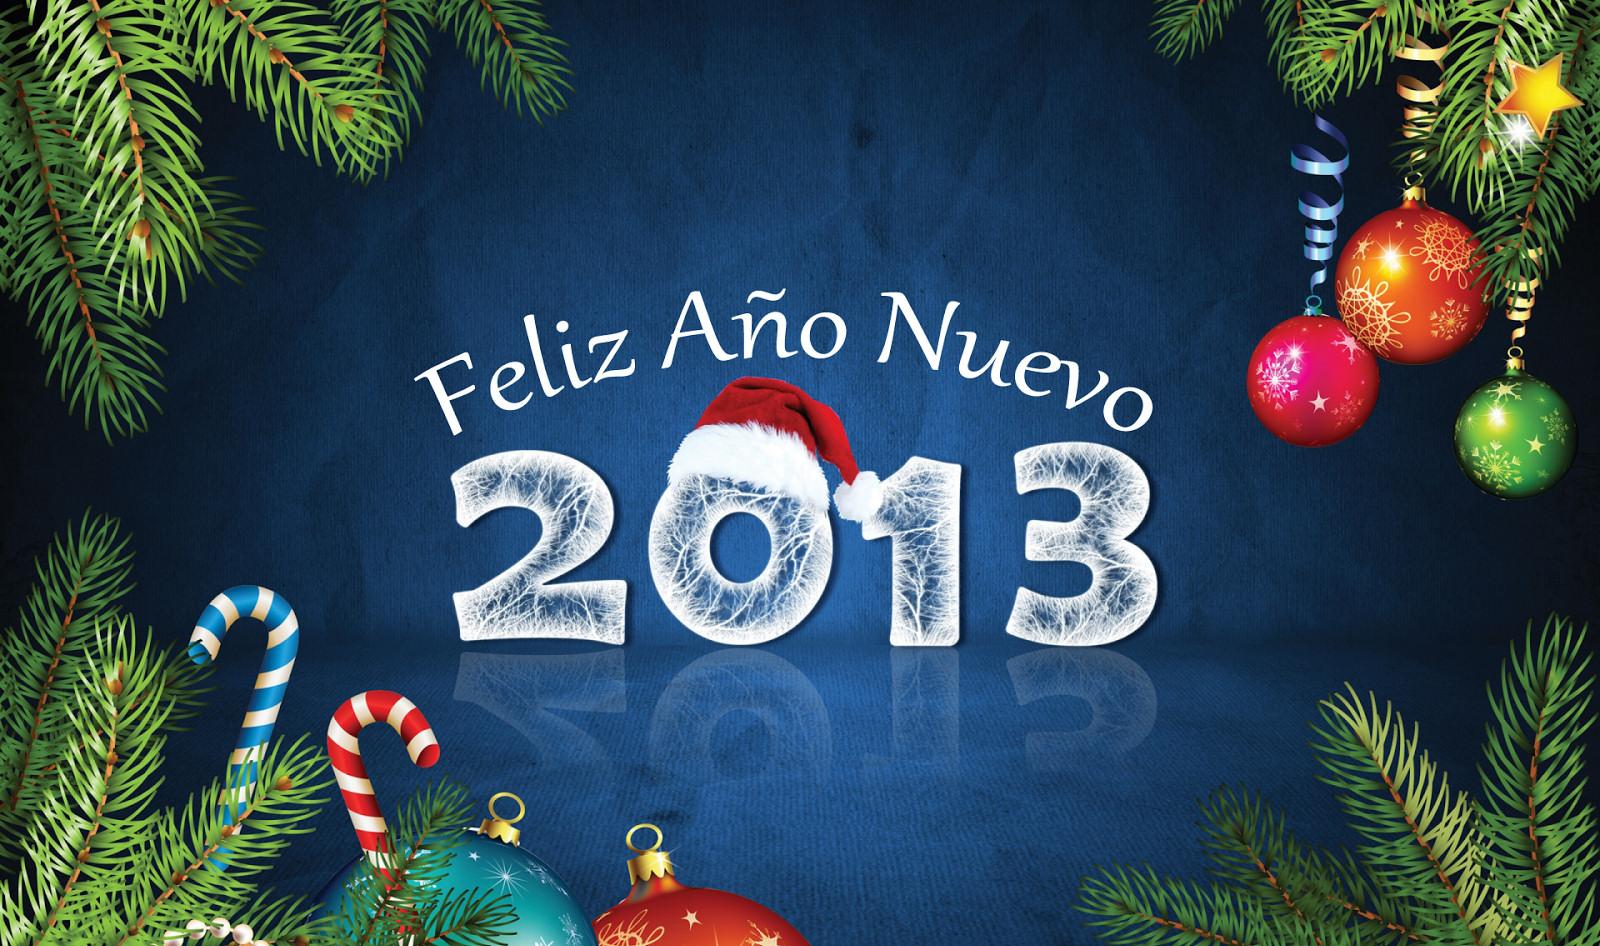 2013 feliz ano nuevo